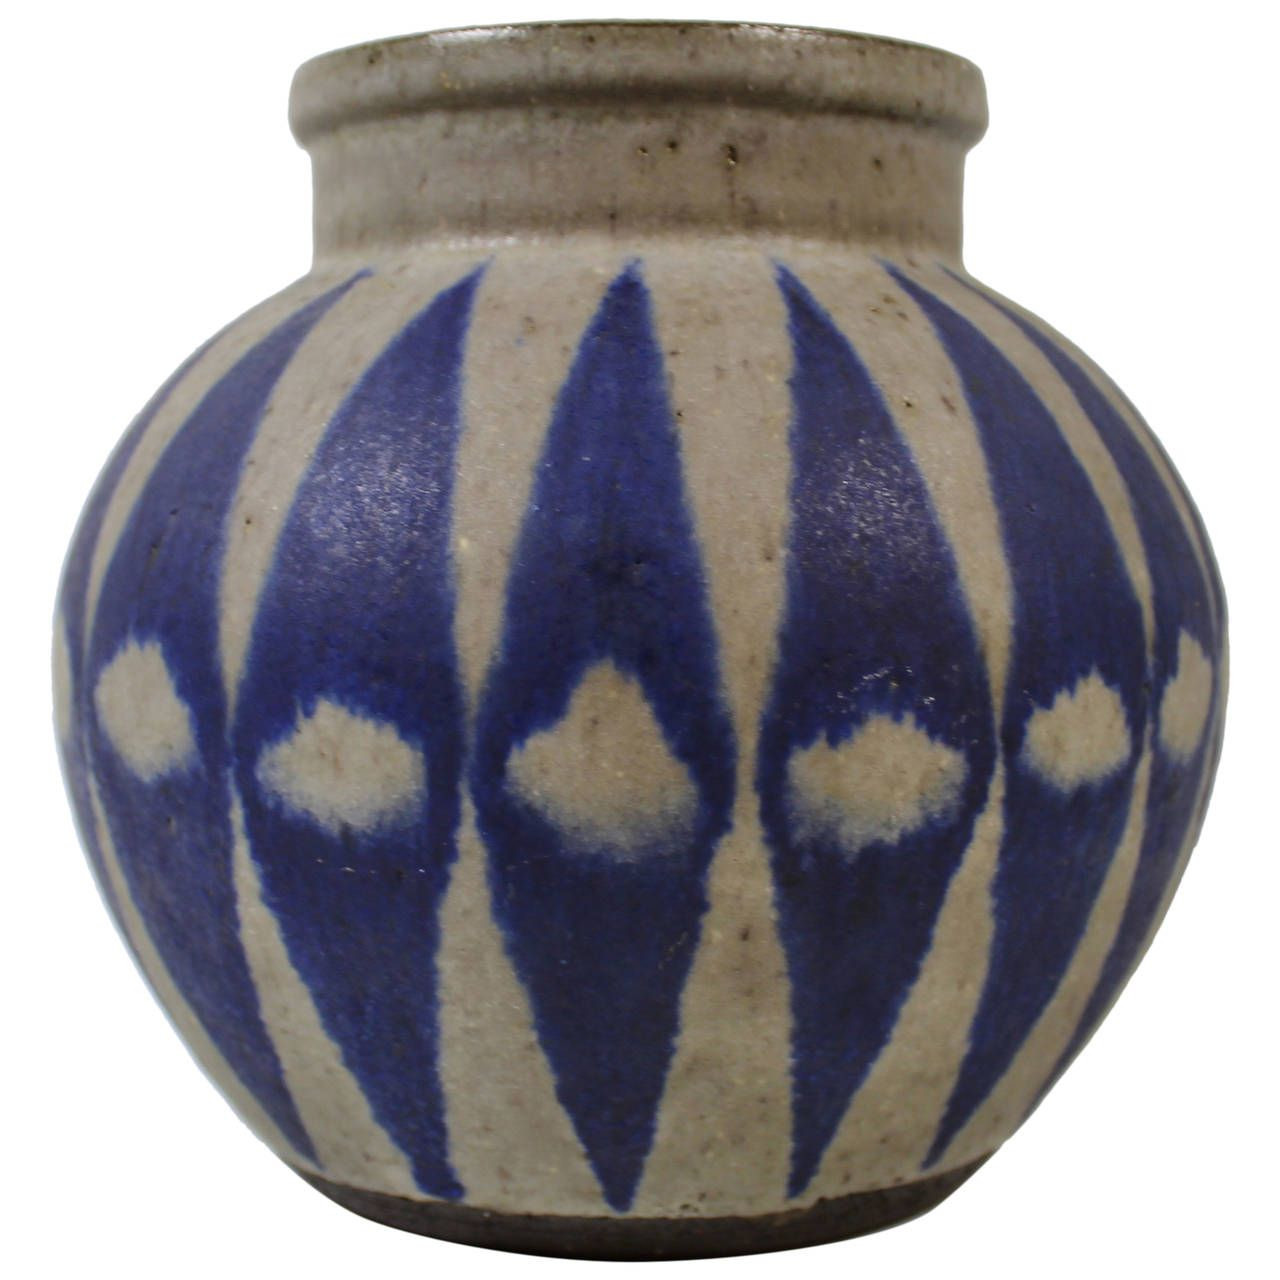 Modern White Ceramic Vase Of Thomas toft Pottery Vase Danish Mid Century Modern Art Pottery Throughout Visit